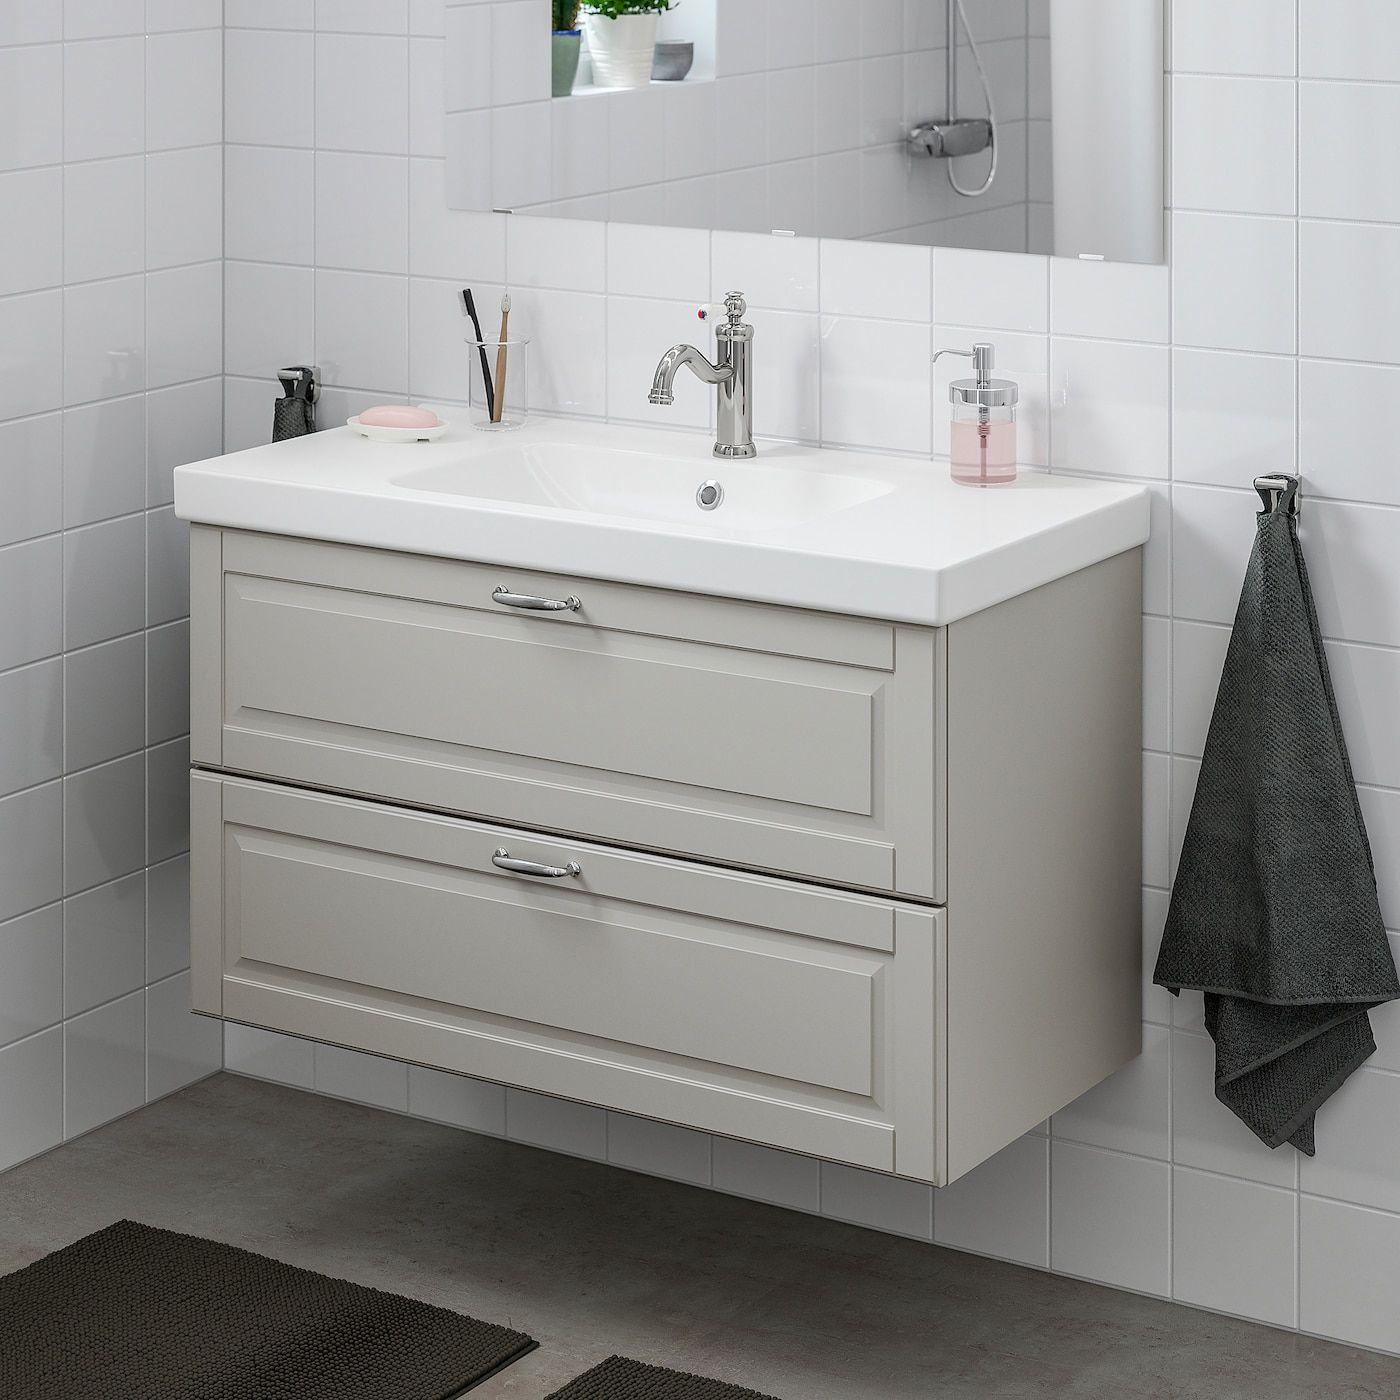 Etagere Pour Vasque A Poser ikea - godmorgon / odensvik bathroom vanity kasjön light